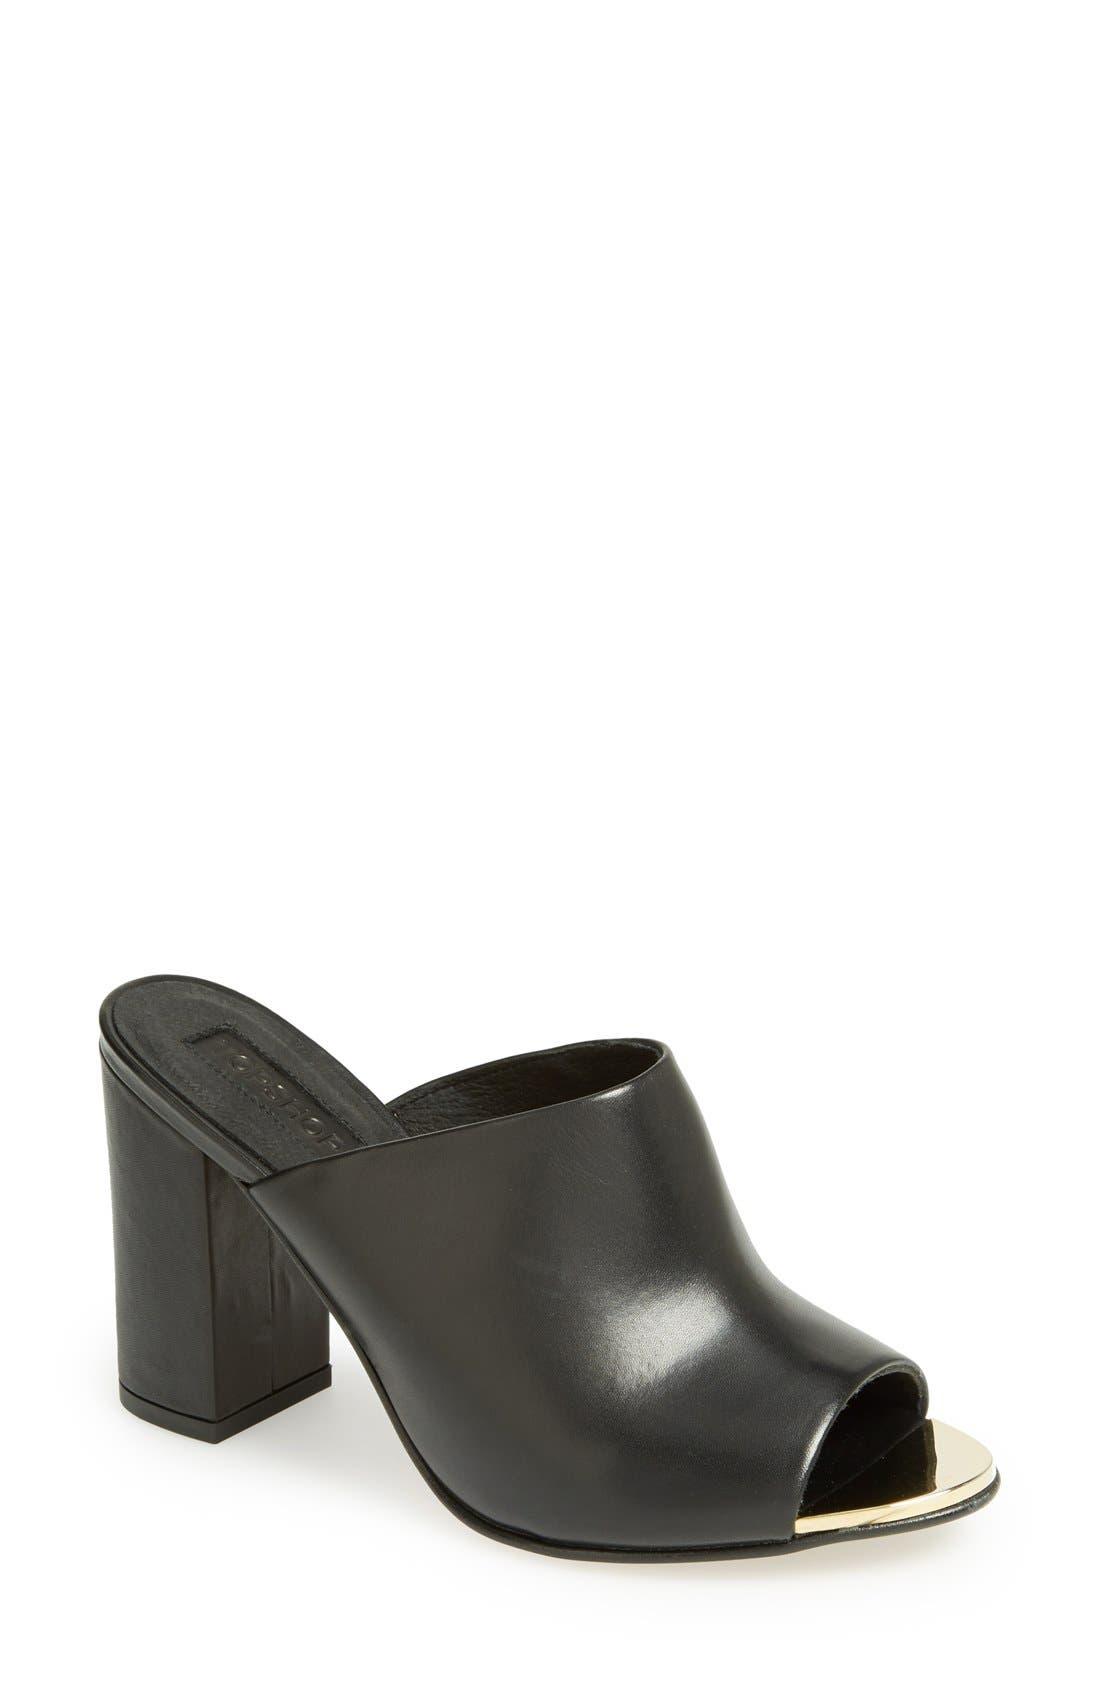 'Glacial' Mule Sandal,                         Main,                         color, 001